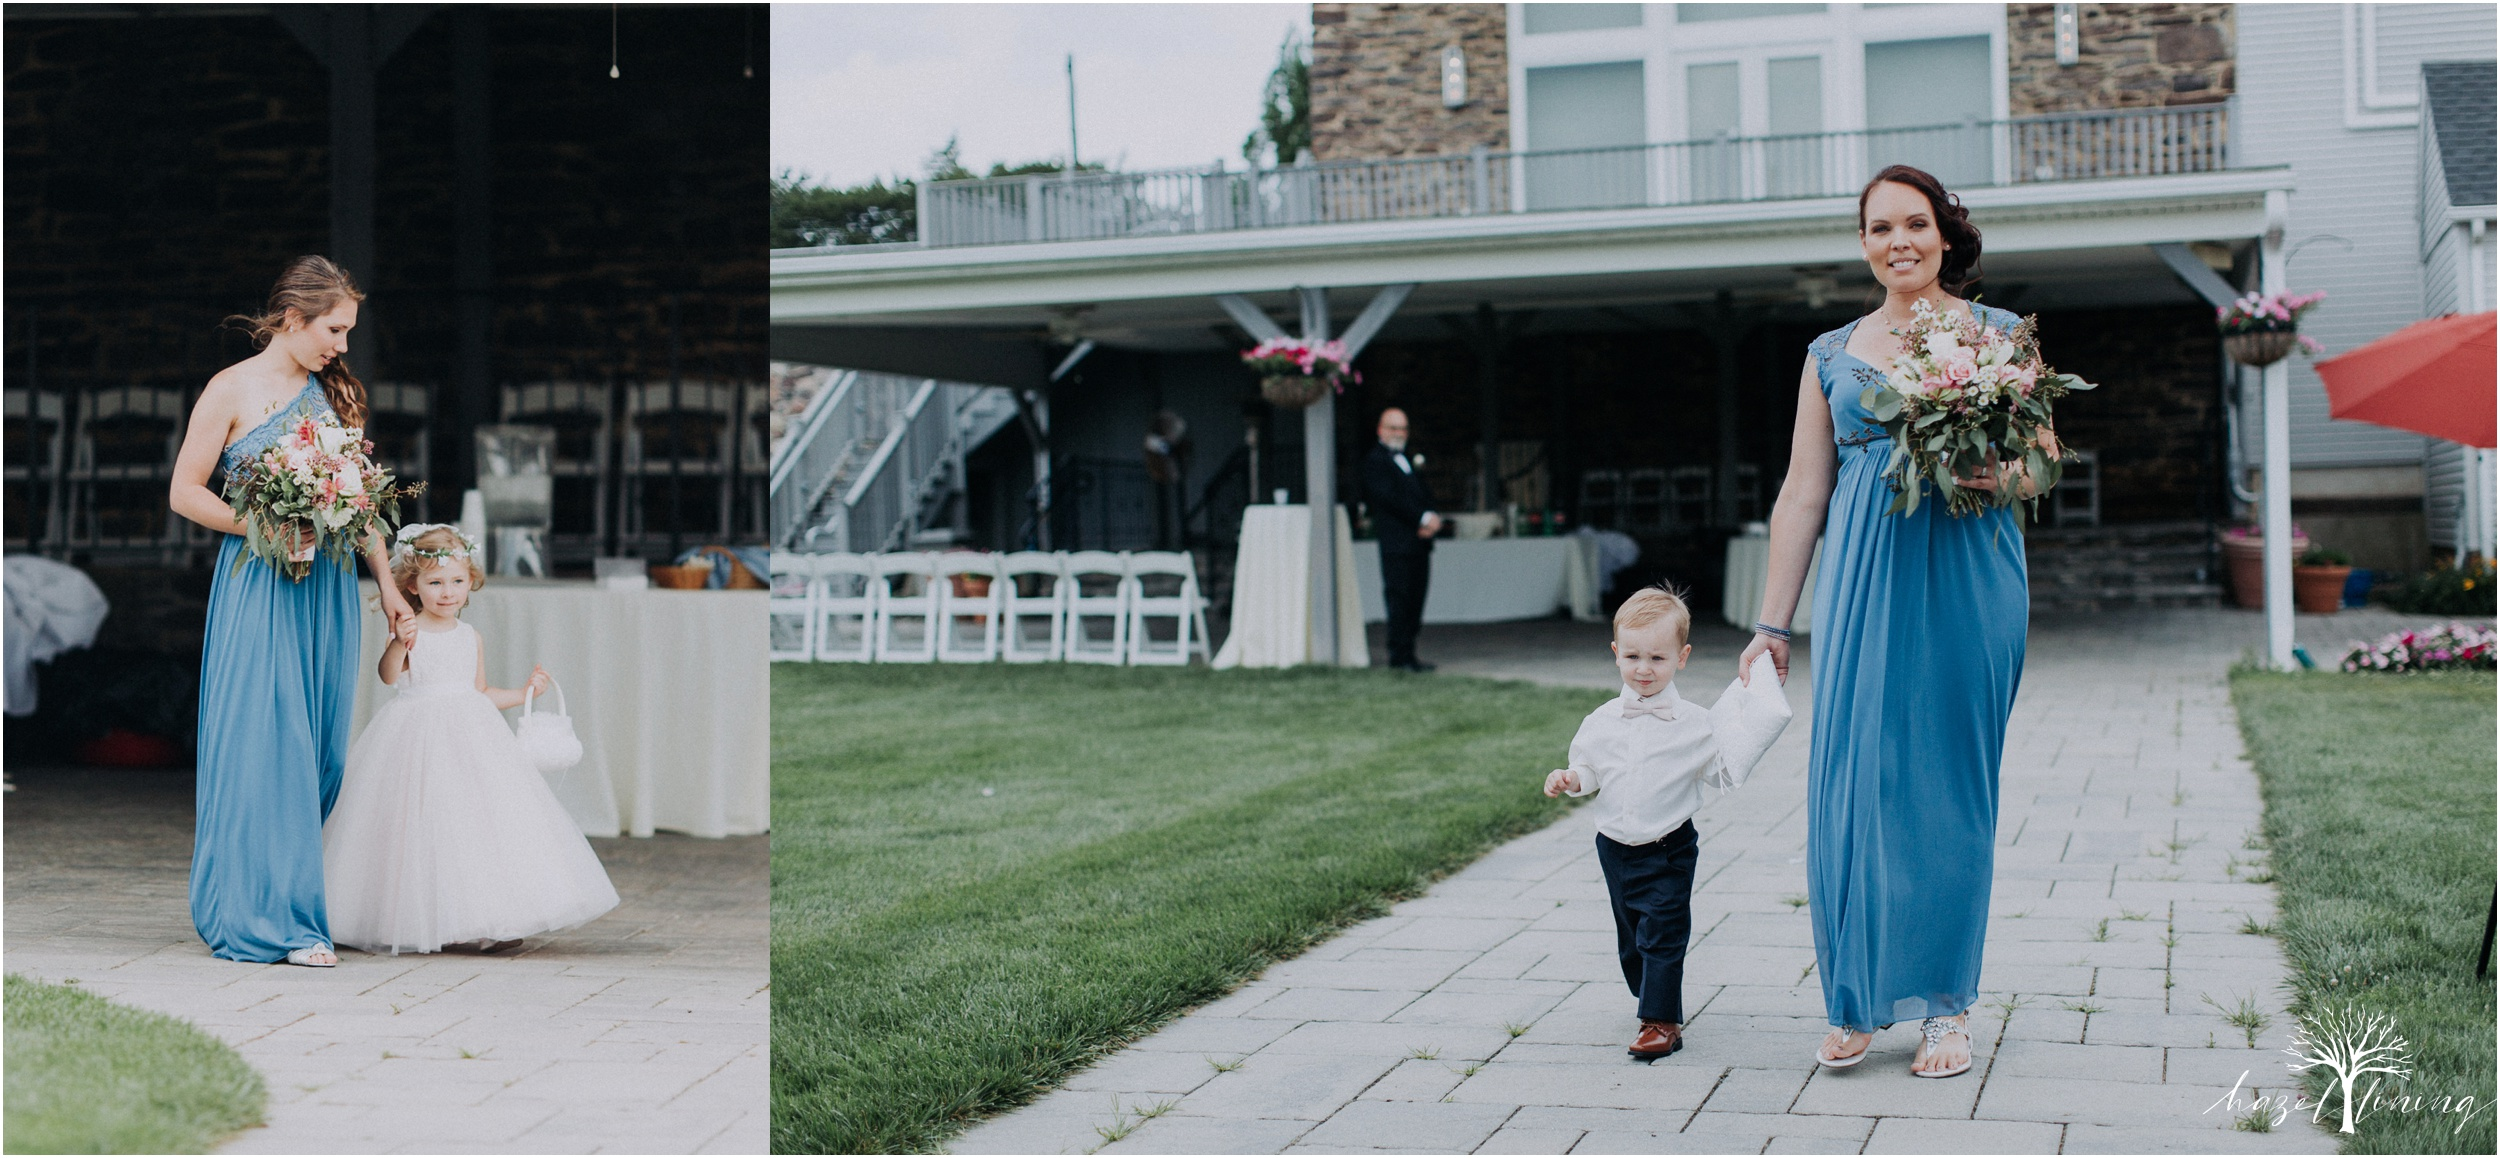 alyssa-james-stiteler-wedding-loft-and-sweet-water-cc-pennsburg-pennsylvania-hazel-lining-travel-wedding-elopement-photography_0047.jpg